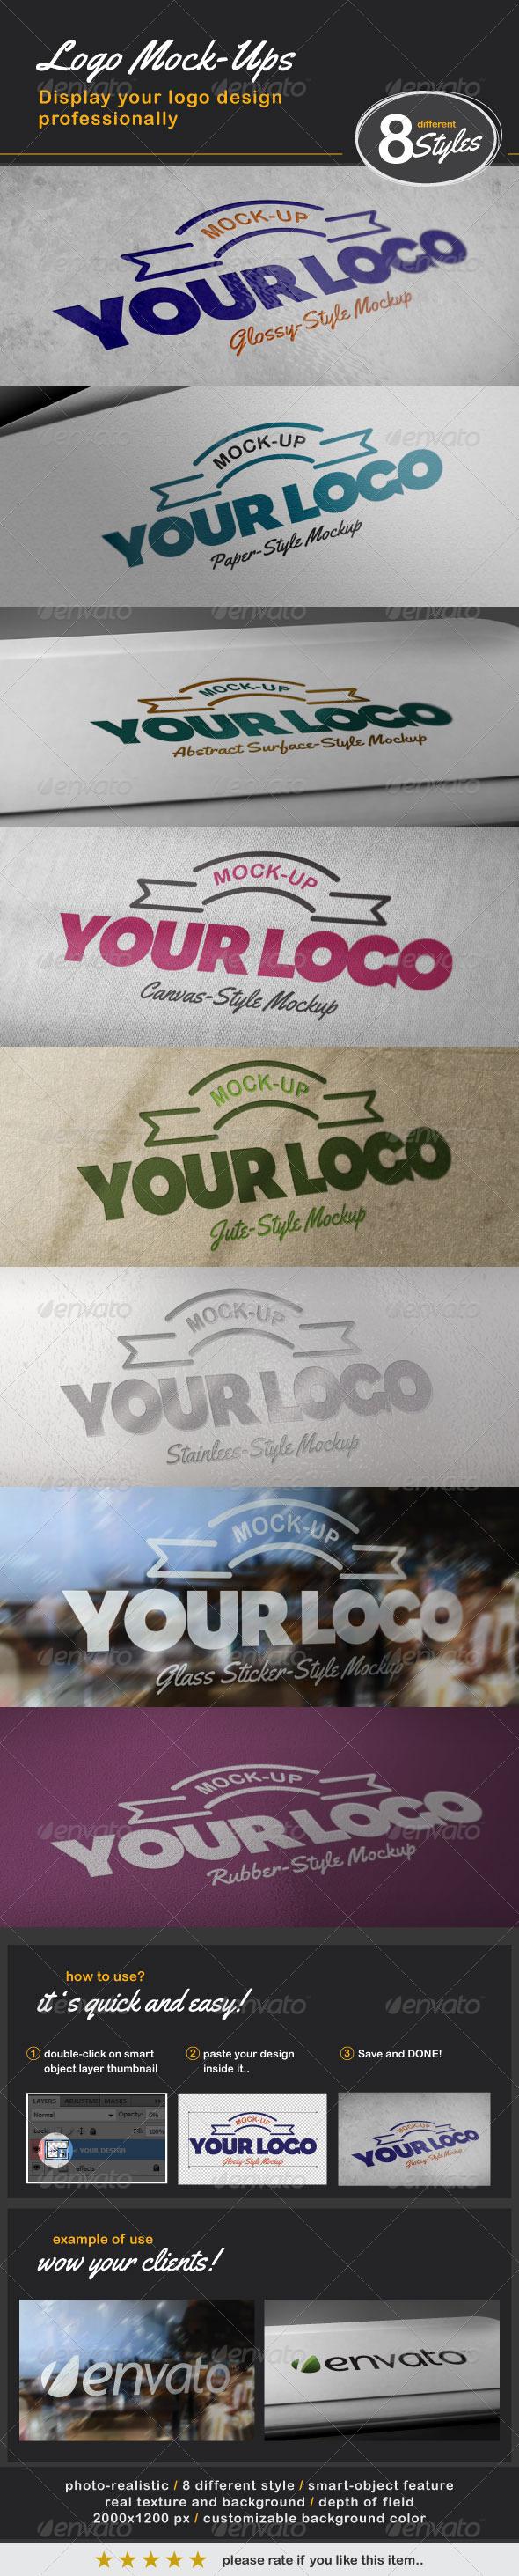 GraphicRiver 8 Photo-Realistic Logo Mock-ups 1602810